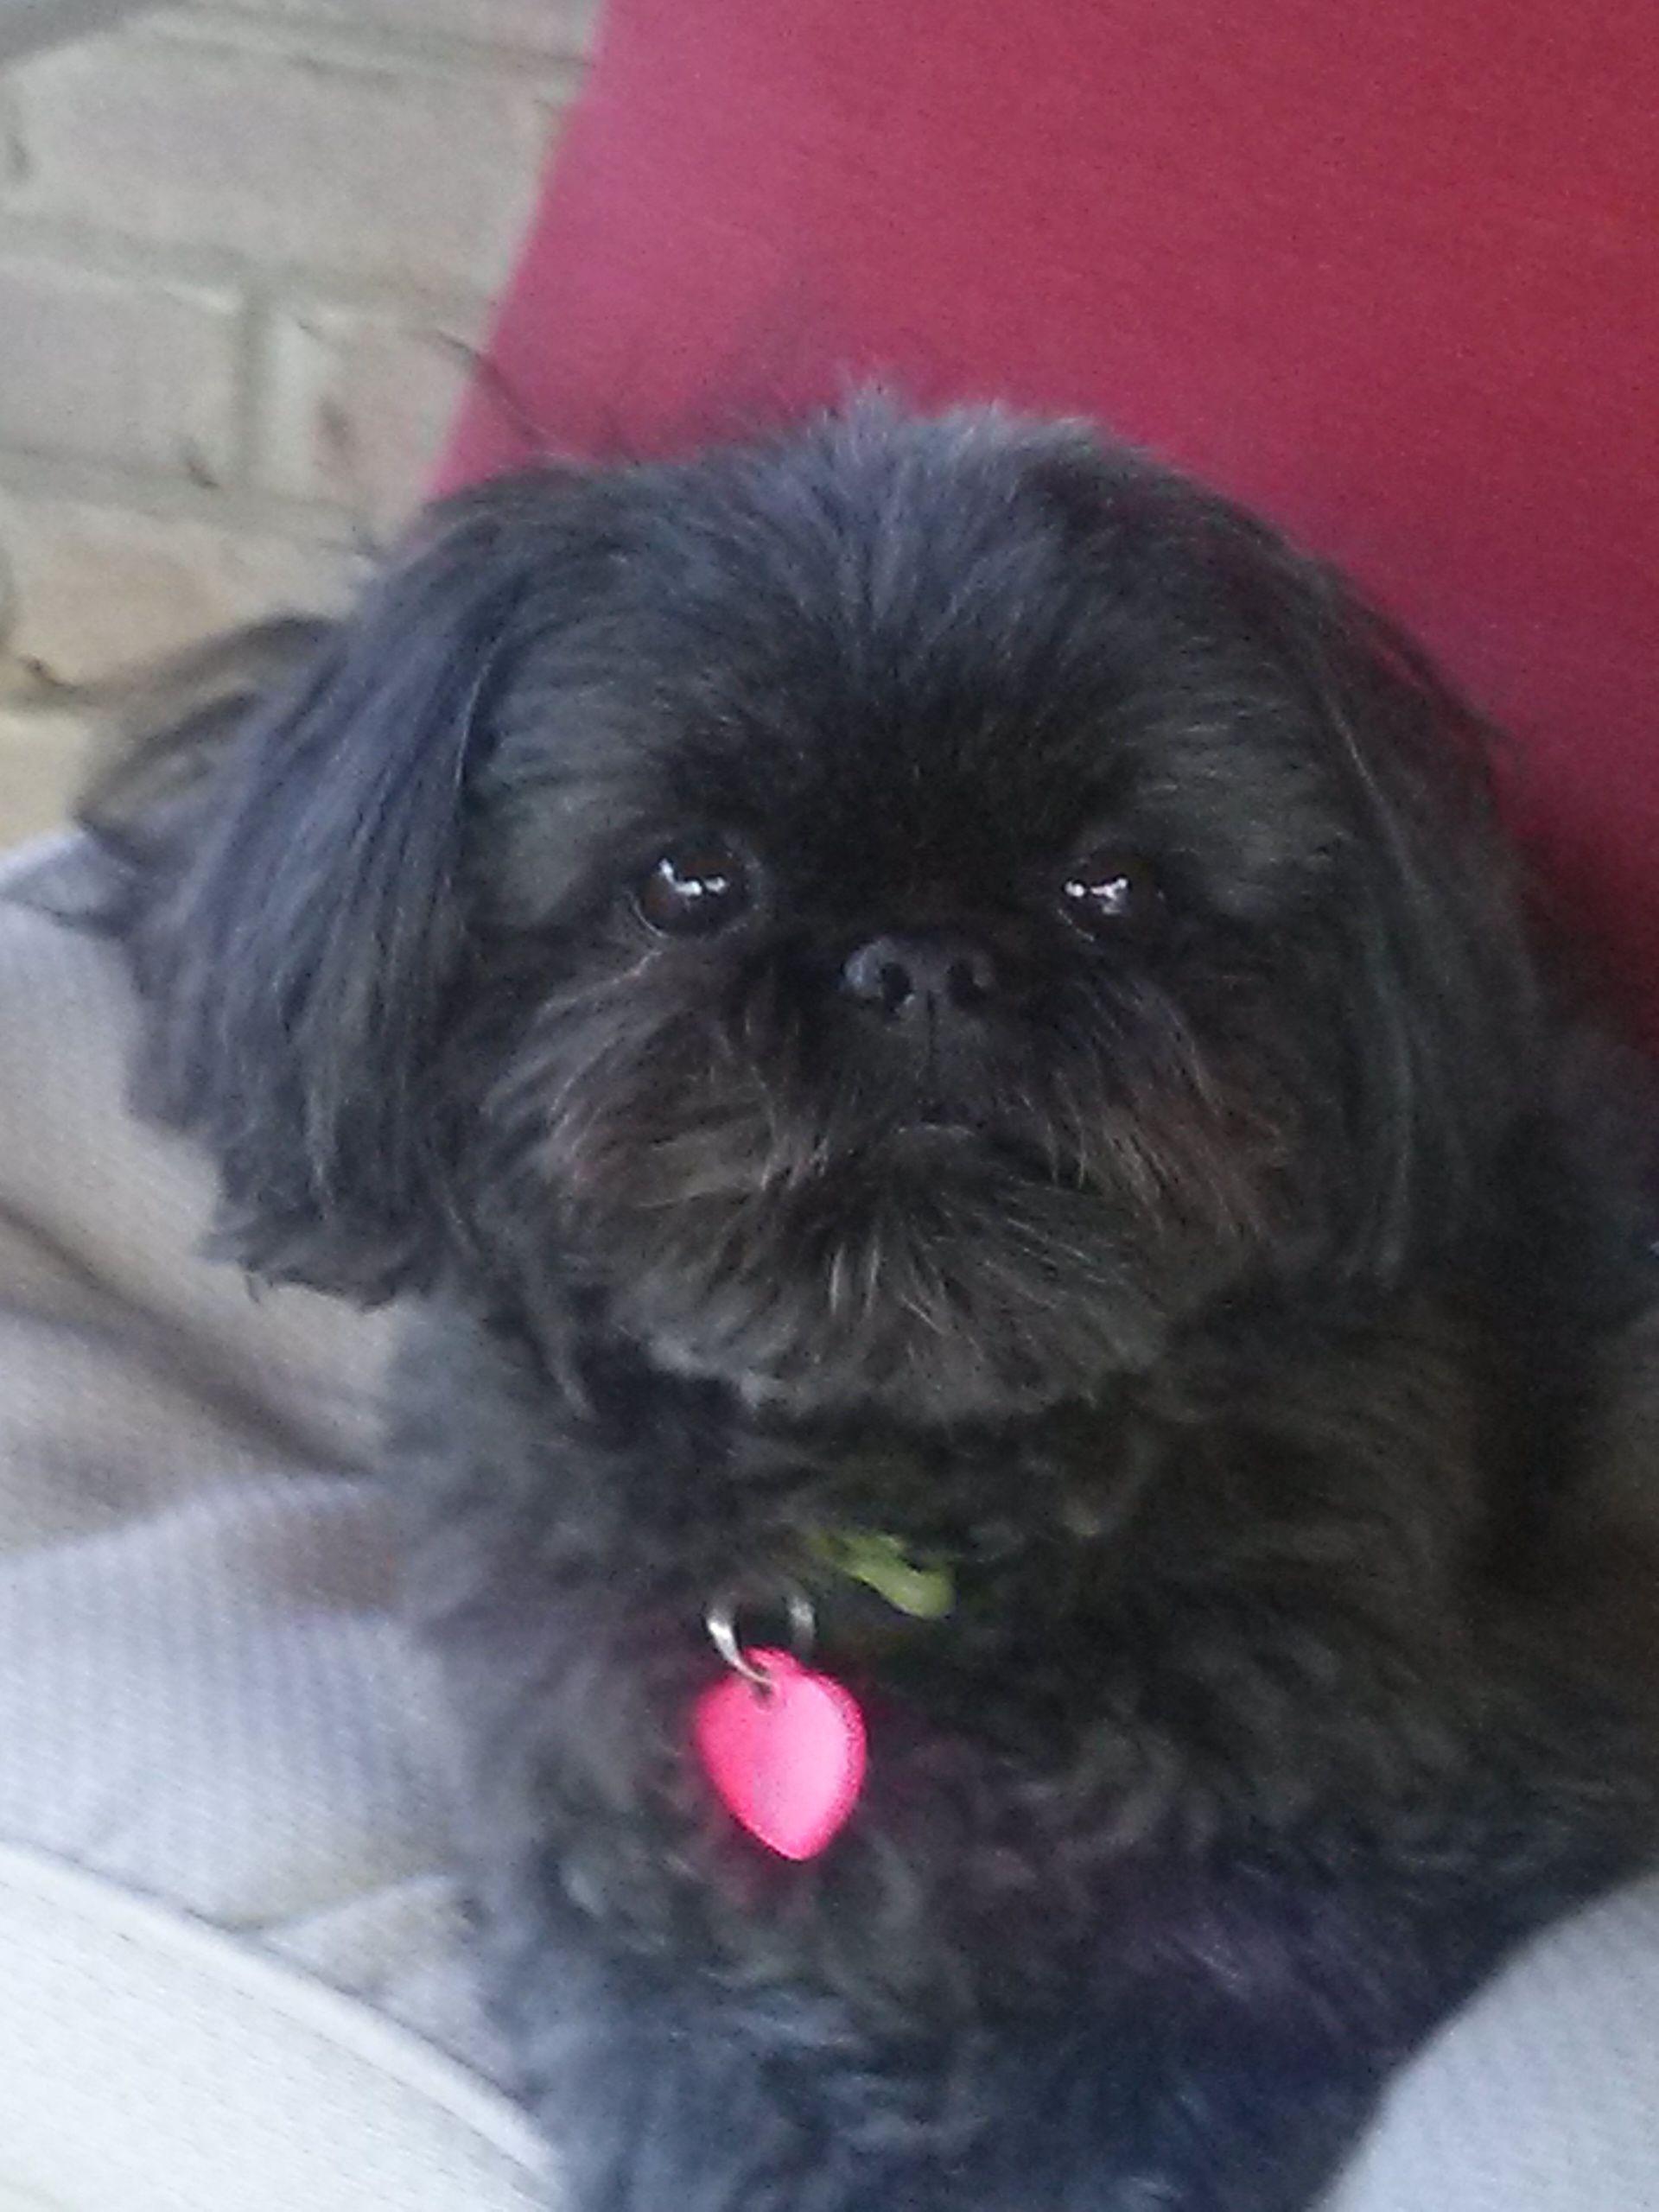 Shih Tzu Affectionate And Playful Shih Tzu Puppy Black Shih